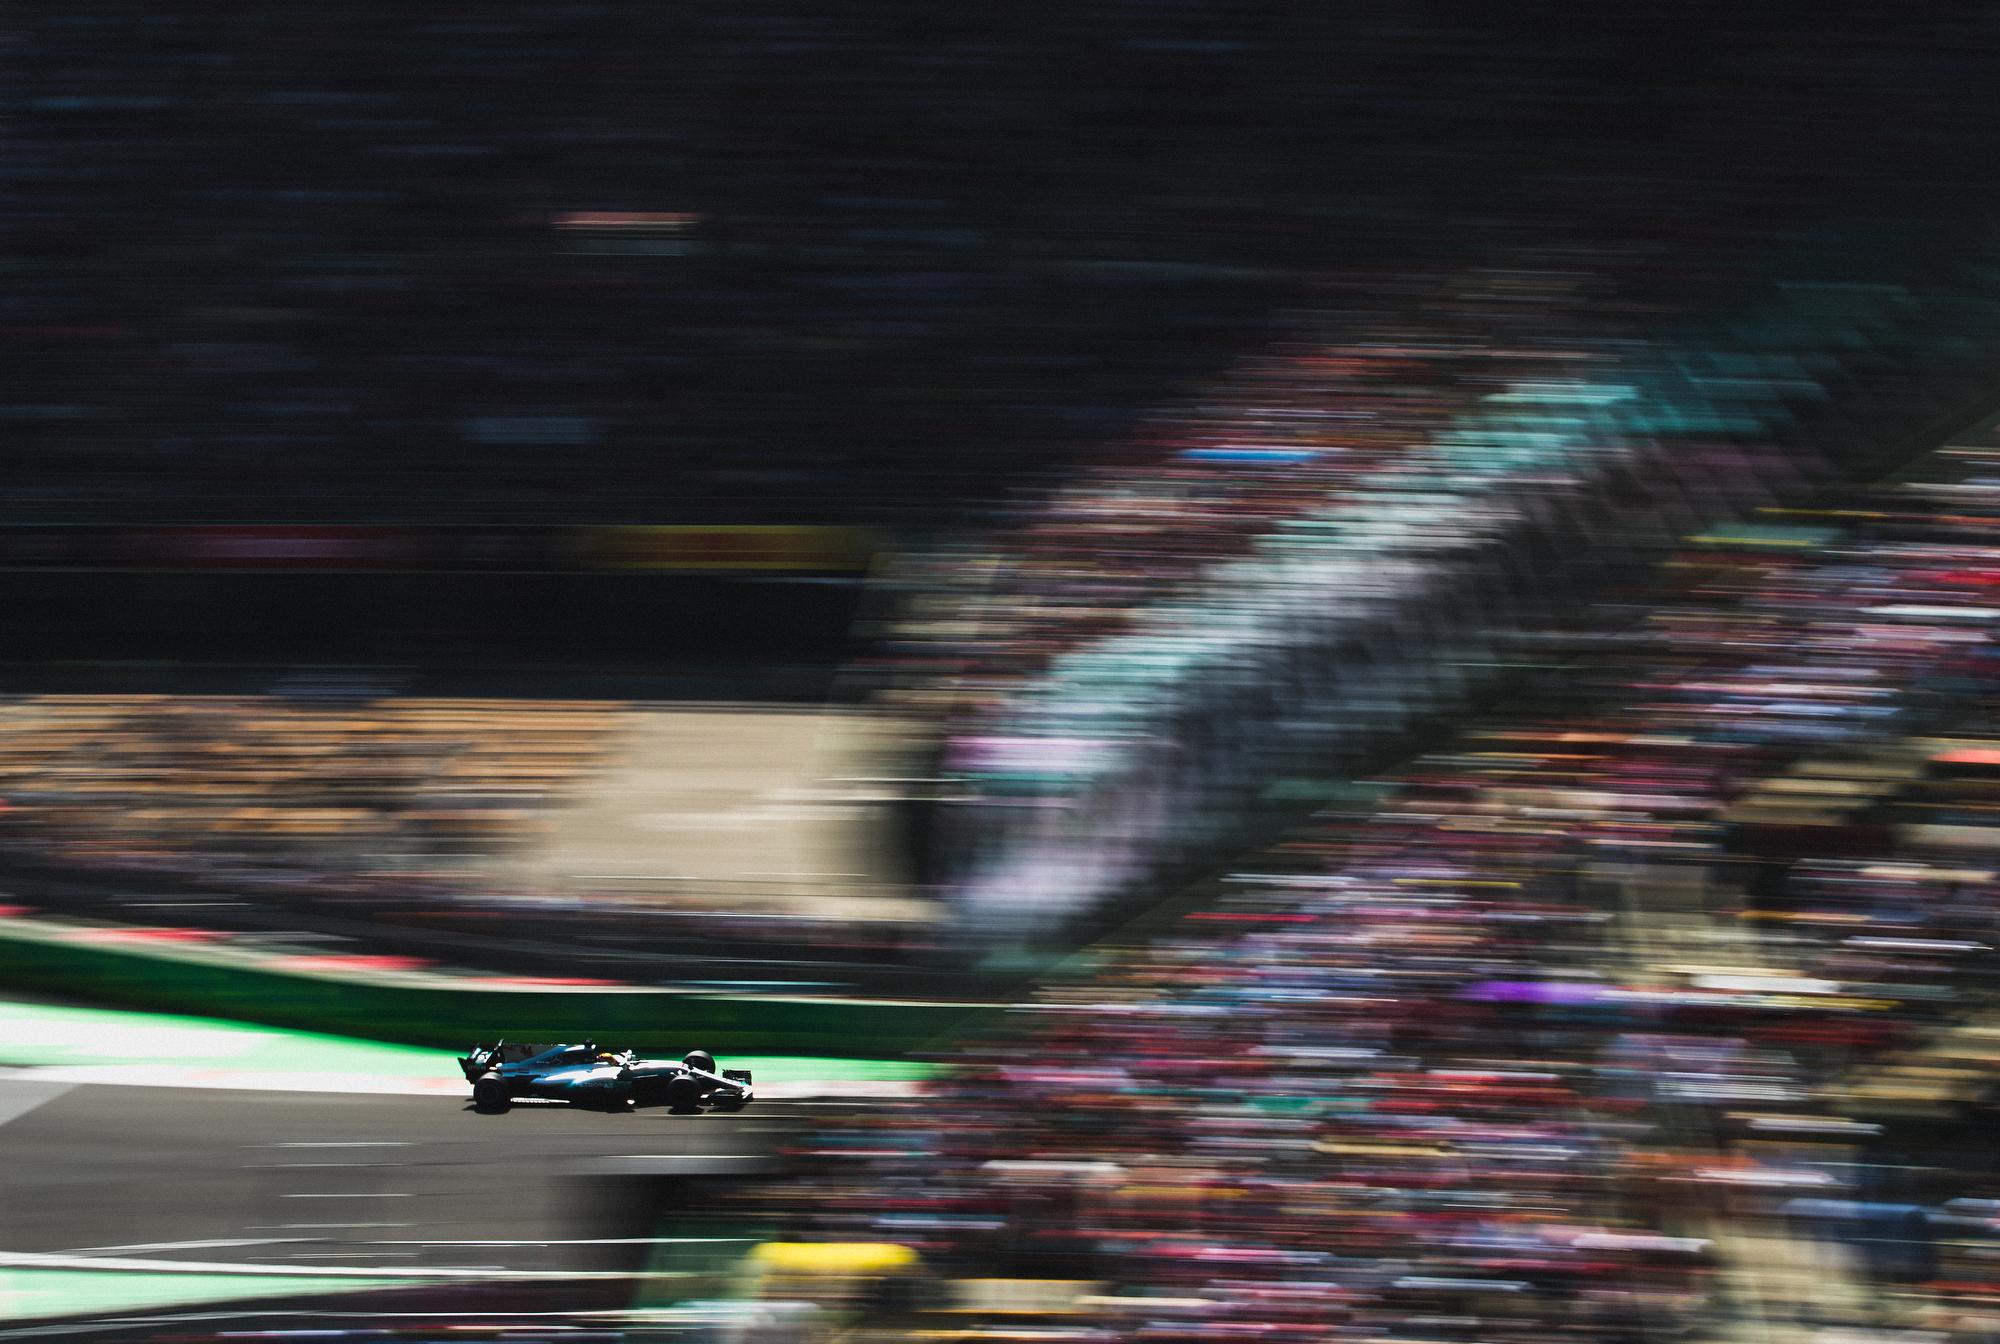 Lewis Hamilton, Mercedes. 2017 FIA Formula 1 Championship, Mexico City, Mexico.